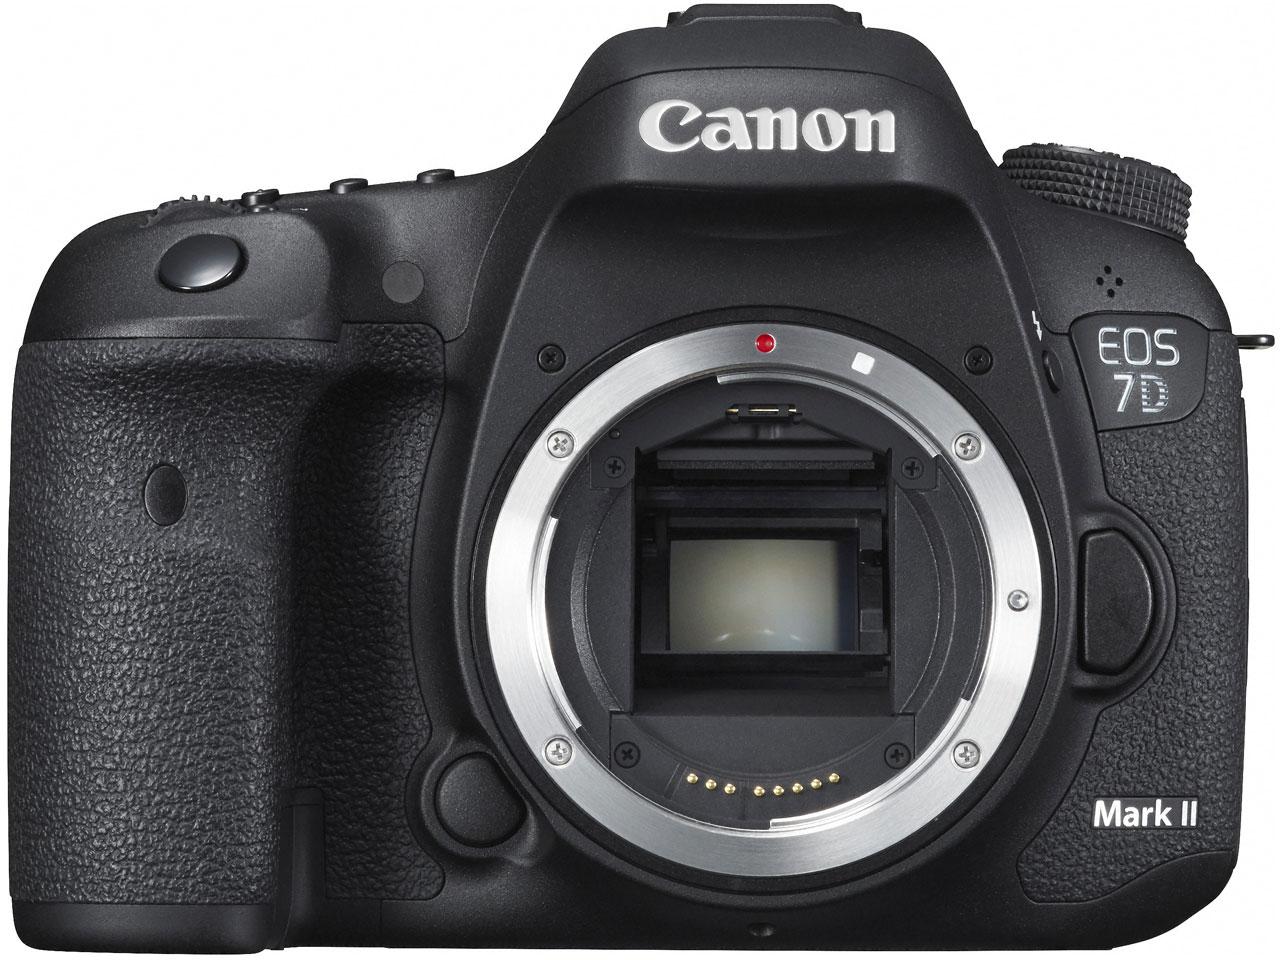 CANON(キヤノン) EOS 7D Mark II ボディ デジタル一眼カメラ